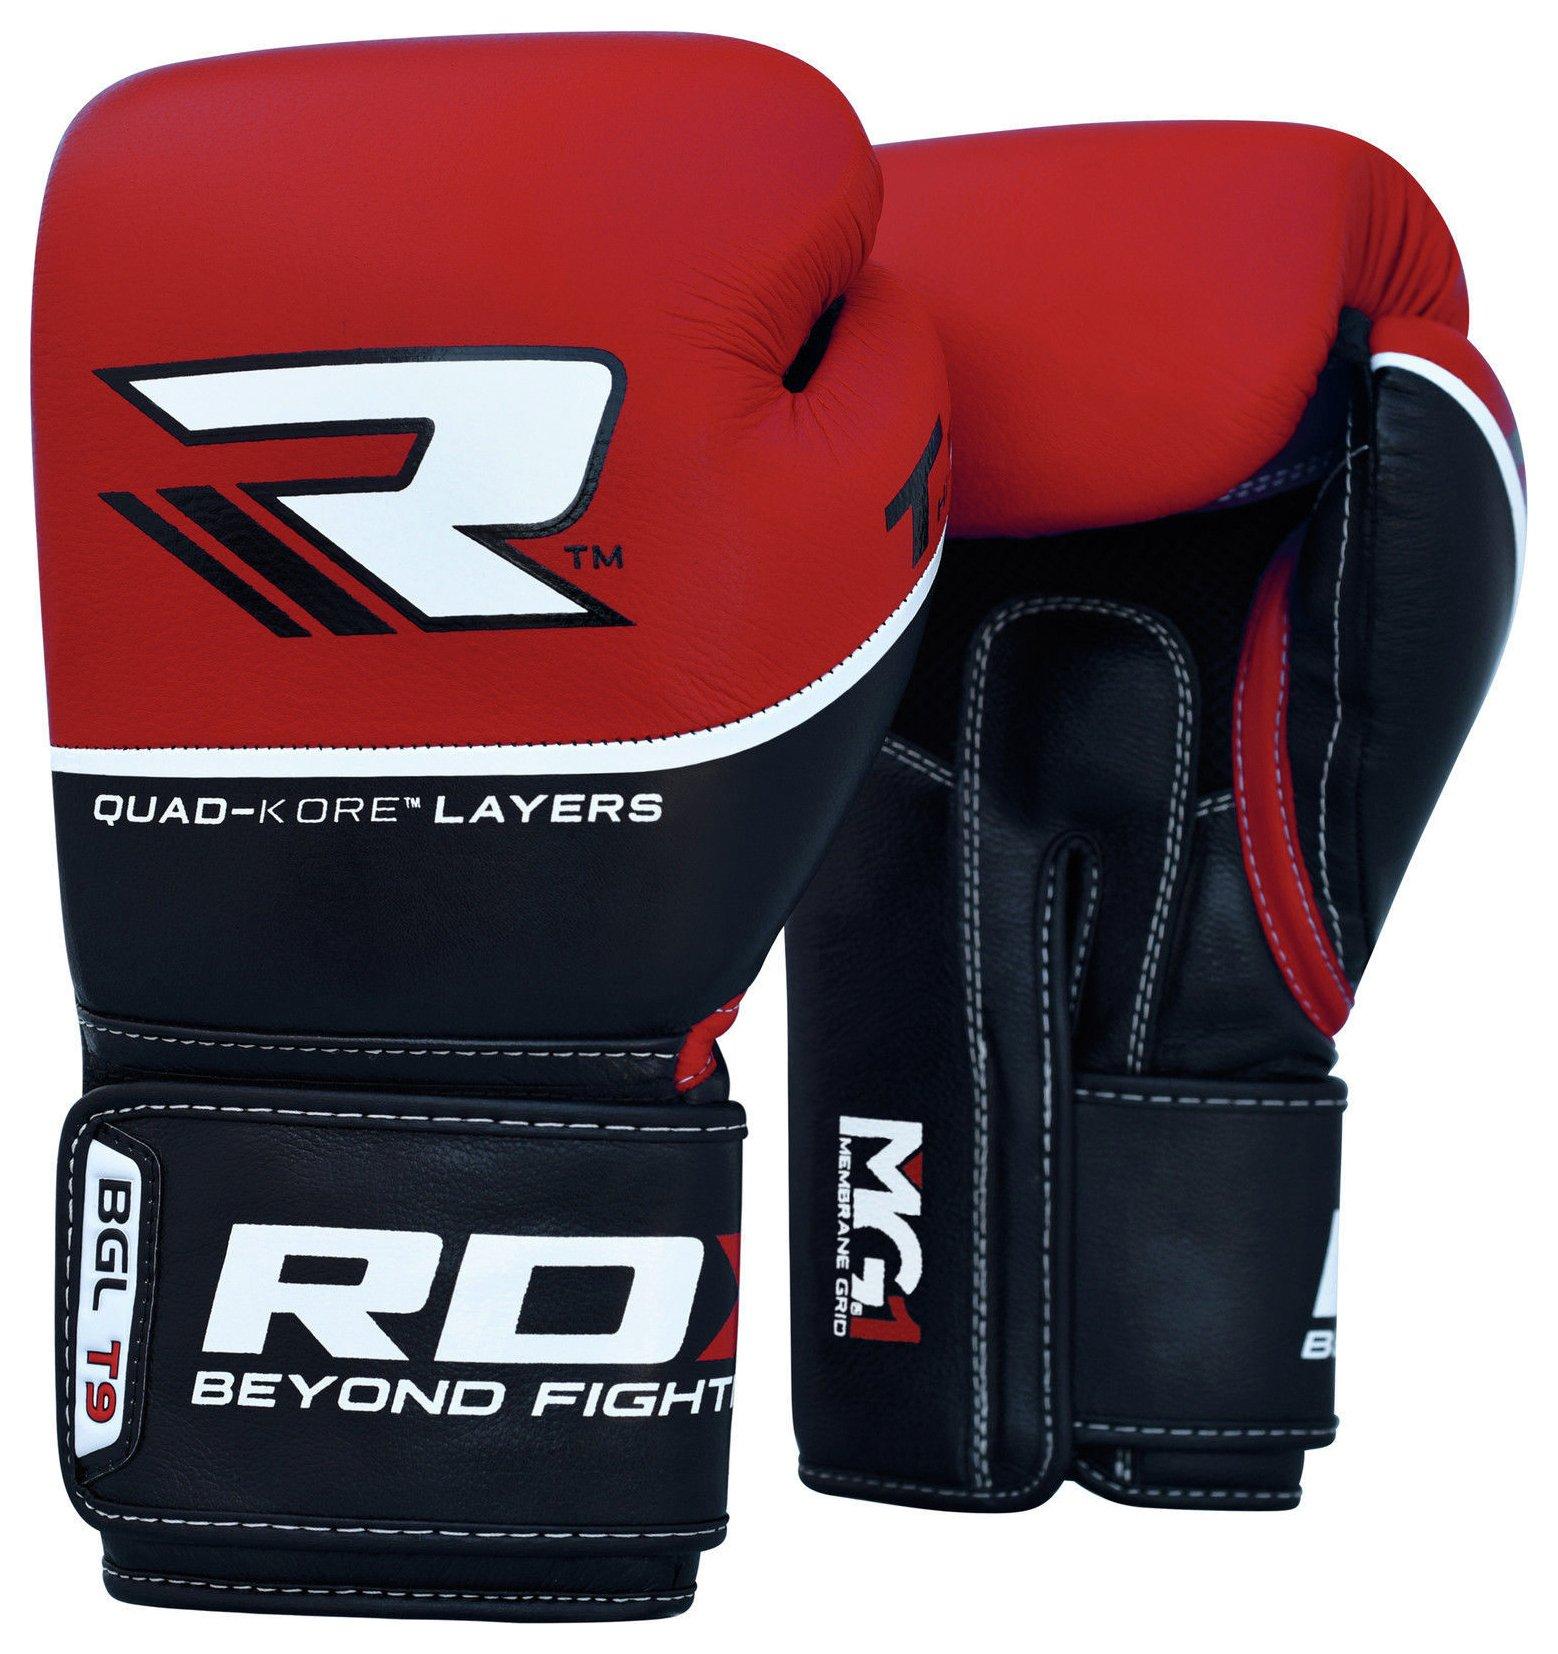 RDX Quad Kore 12oz Boxing Gloves - Red.